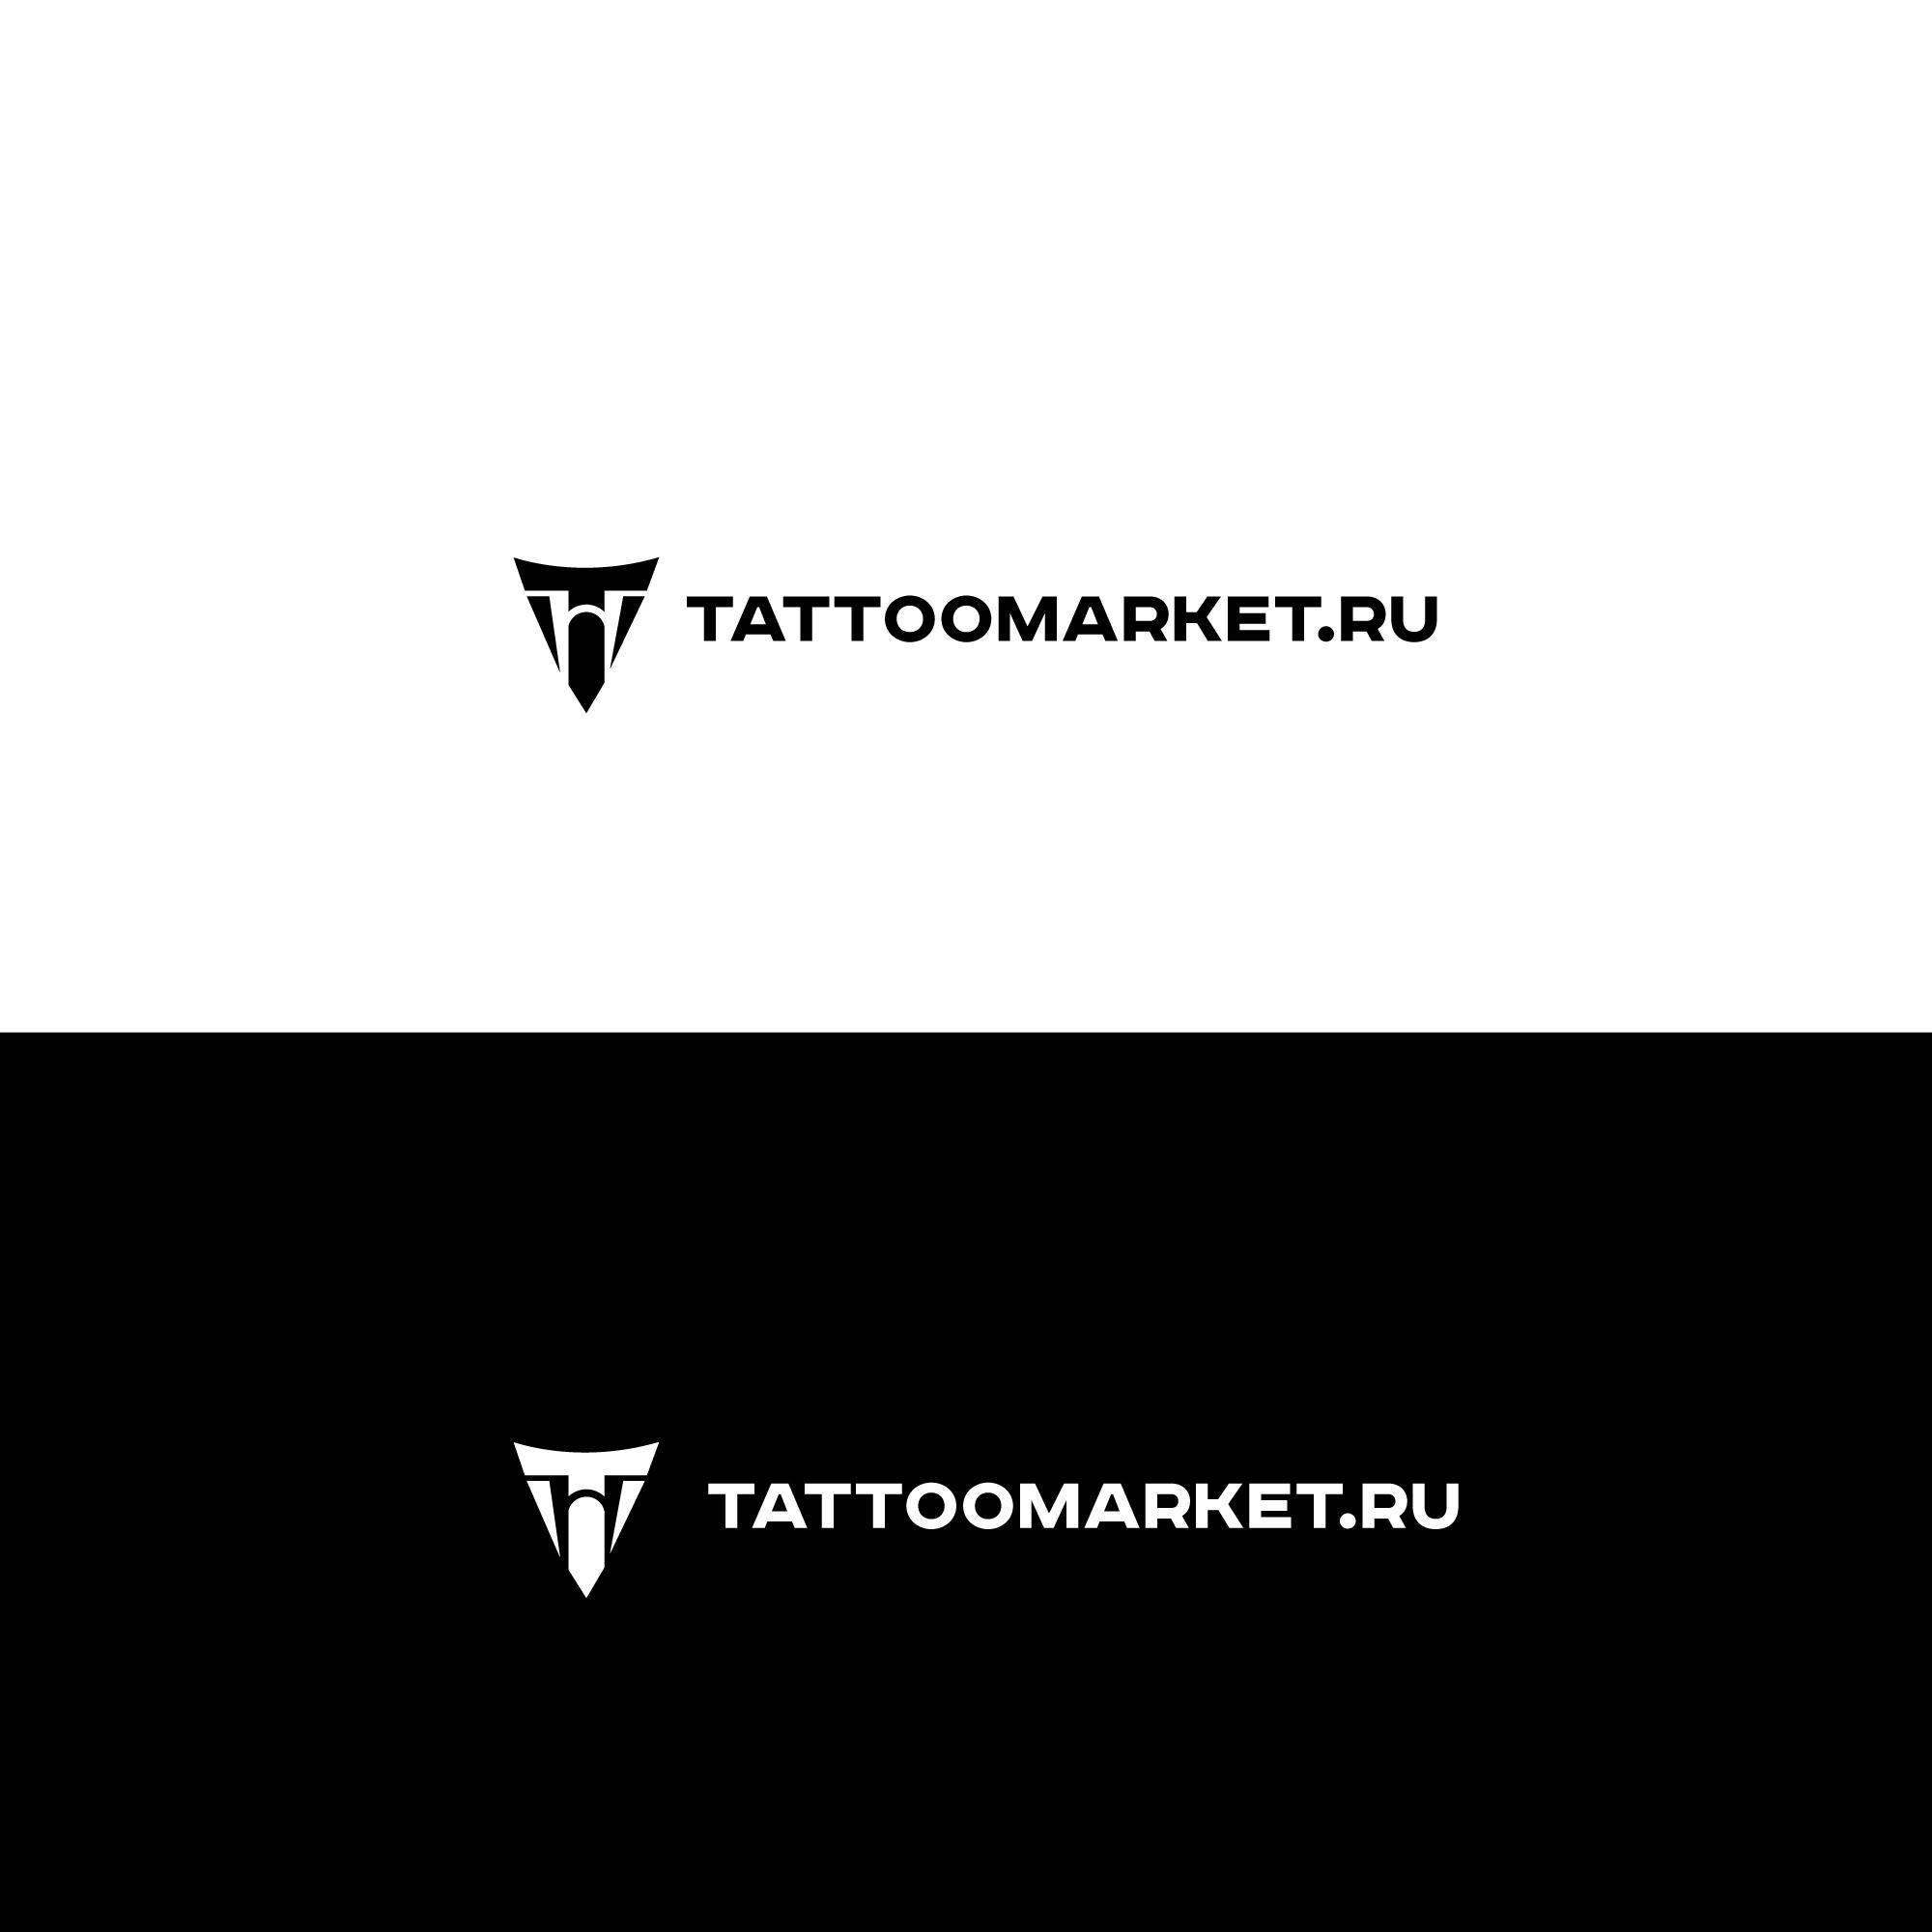 Редизайн логотипа магазина тату оборудования TattooMarket.ru фото f_6775c4022ed3cbfe.jpg